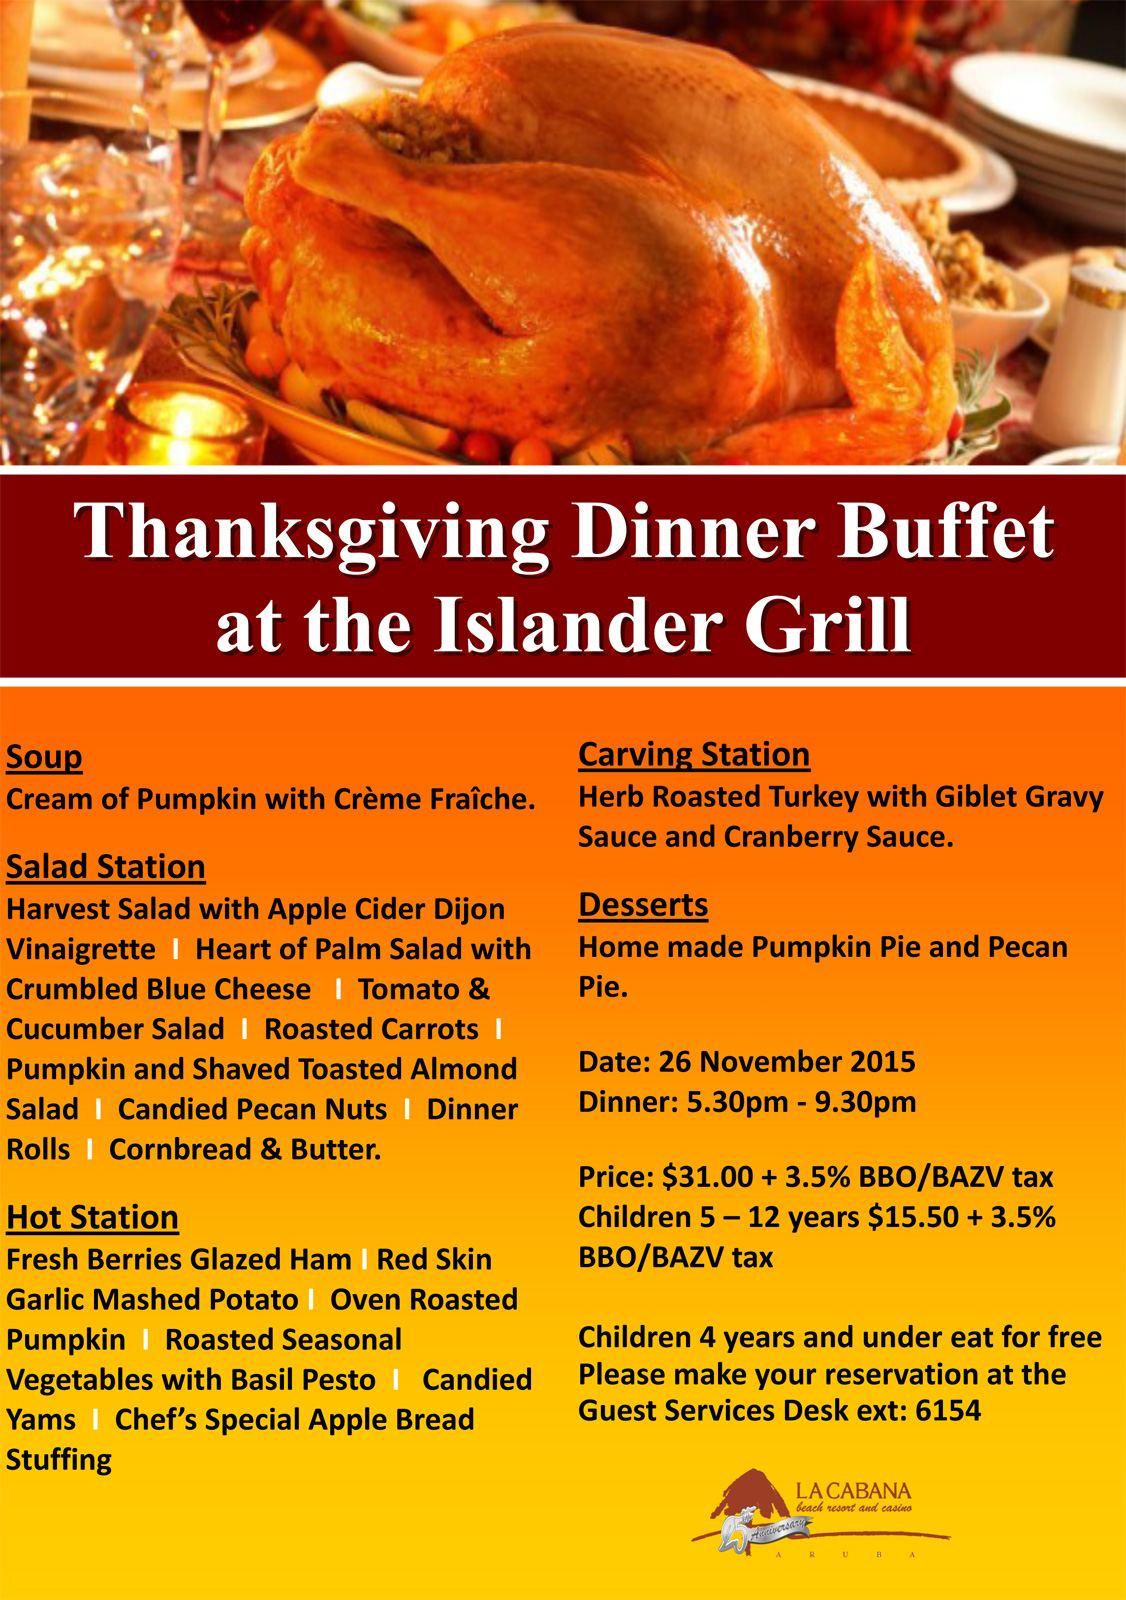 Aruba restaurants aruba restaurants thanksgiving day for Fast food places open on thanksgiving